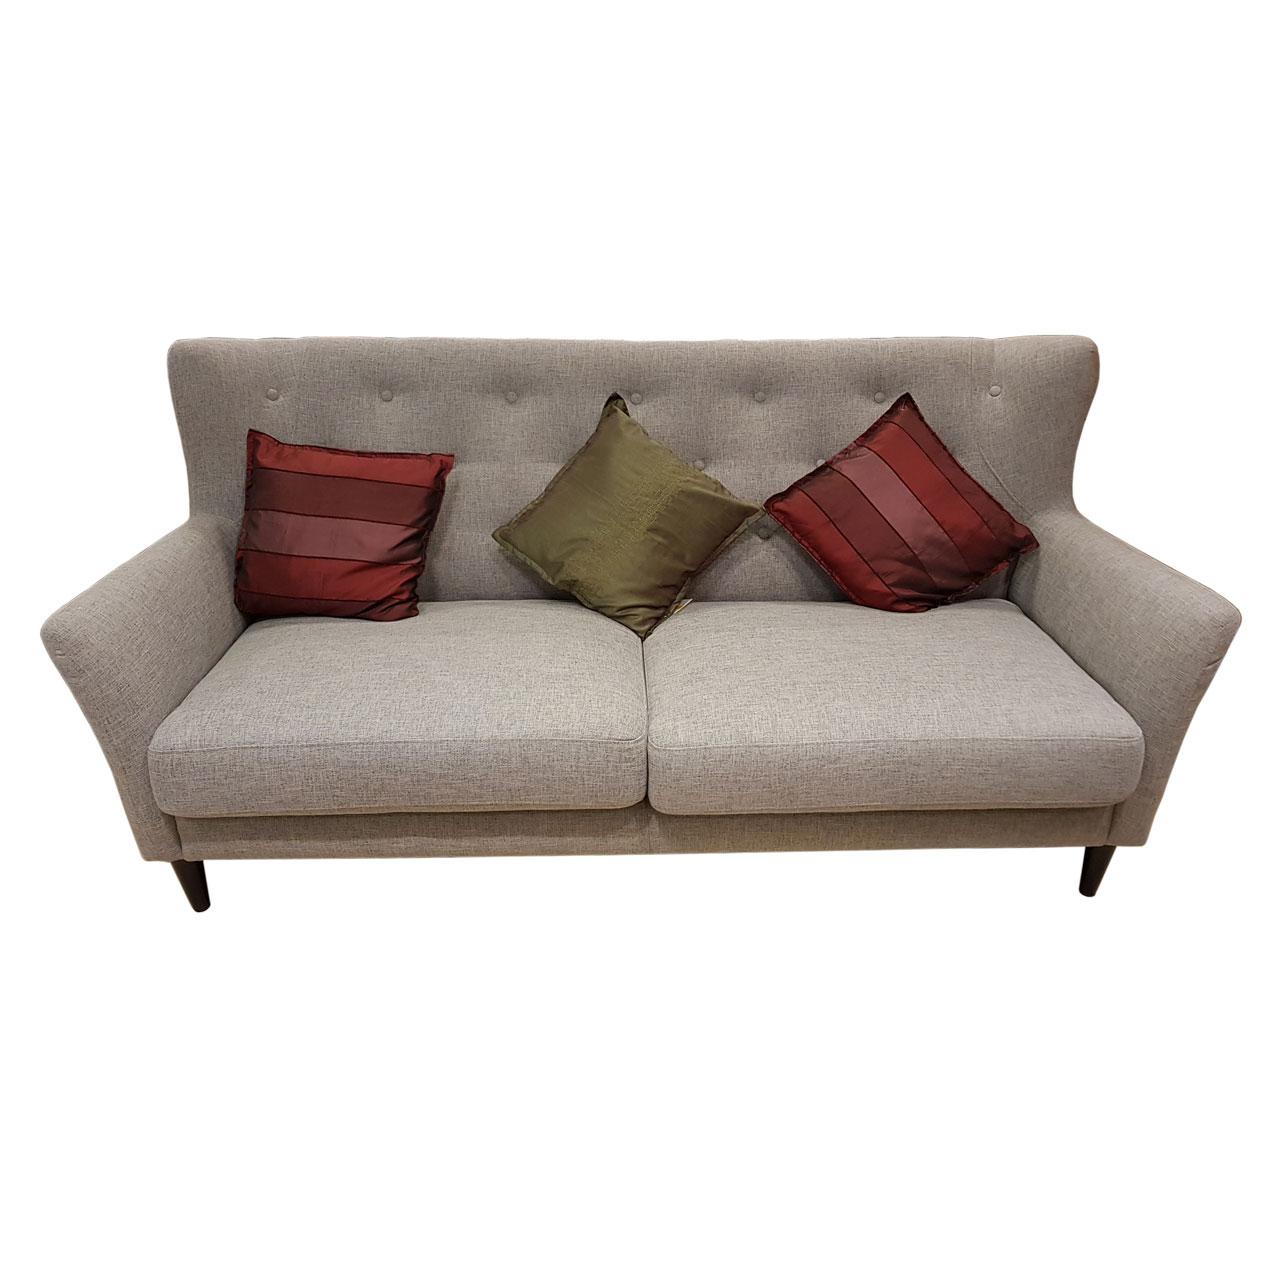 emma tufted sofa hay usa scilla furniture store manila philippines urban